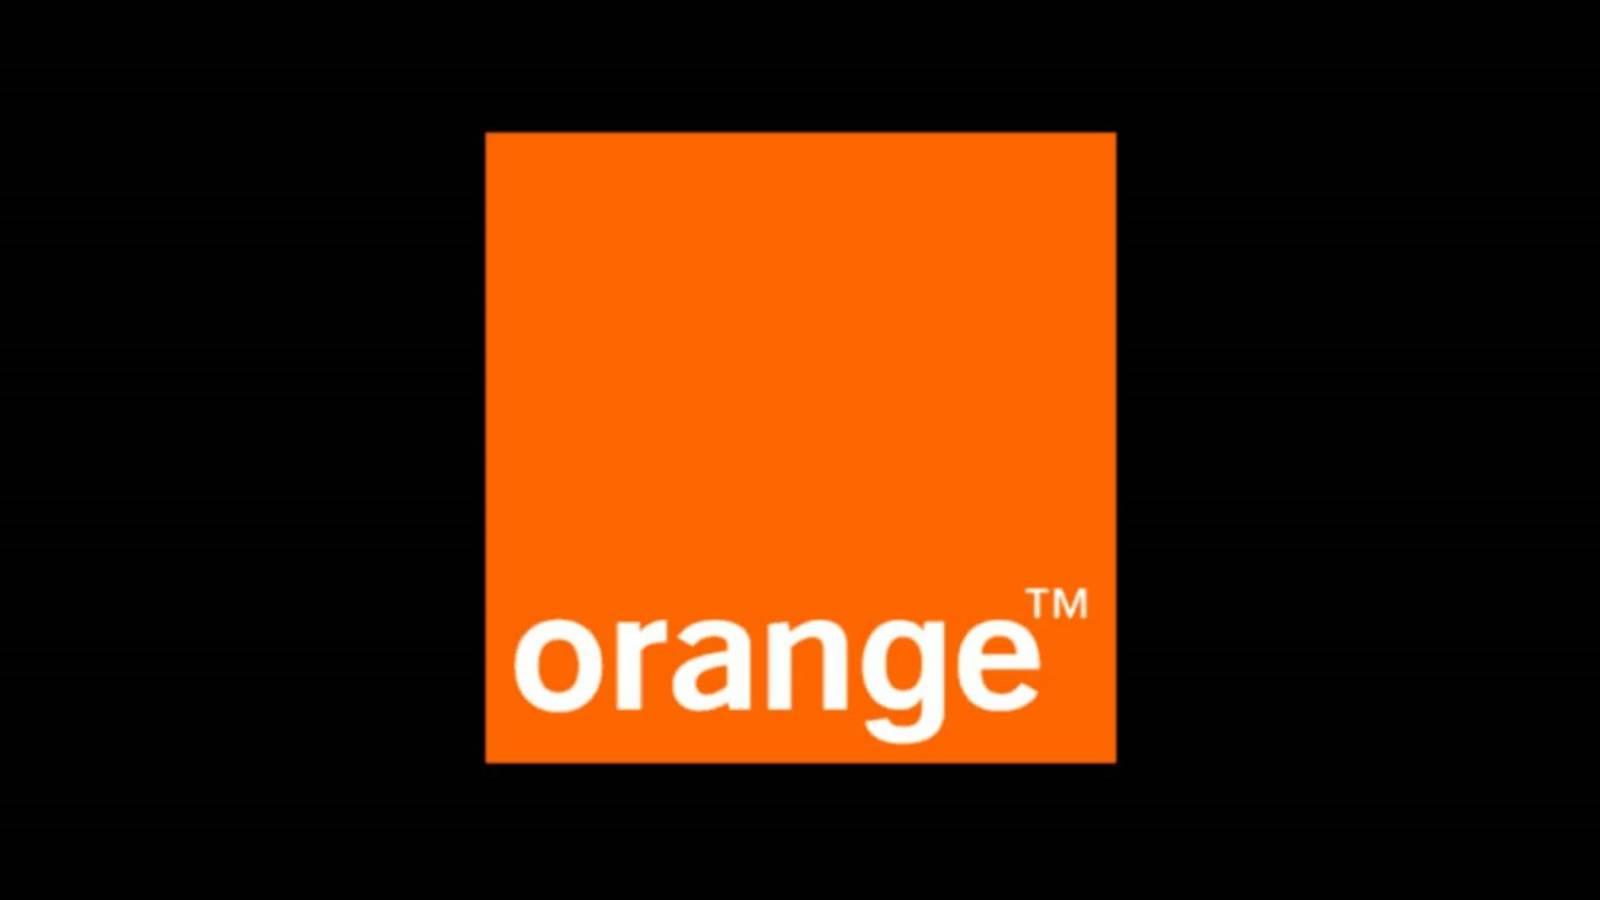 orange organizare